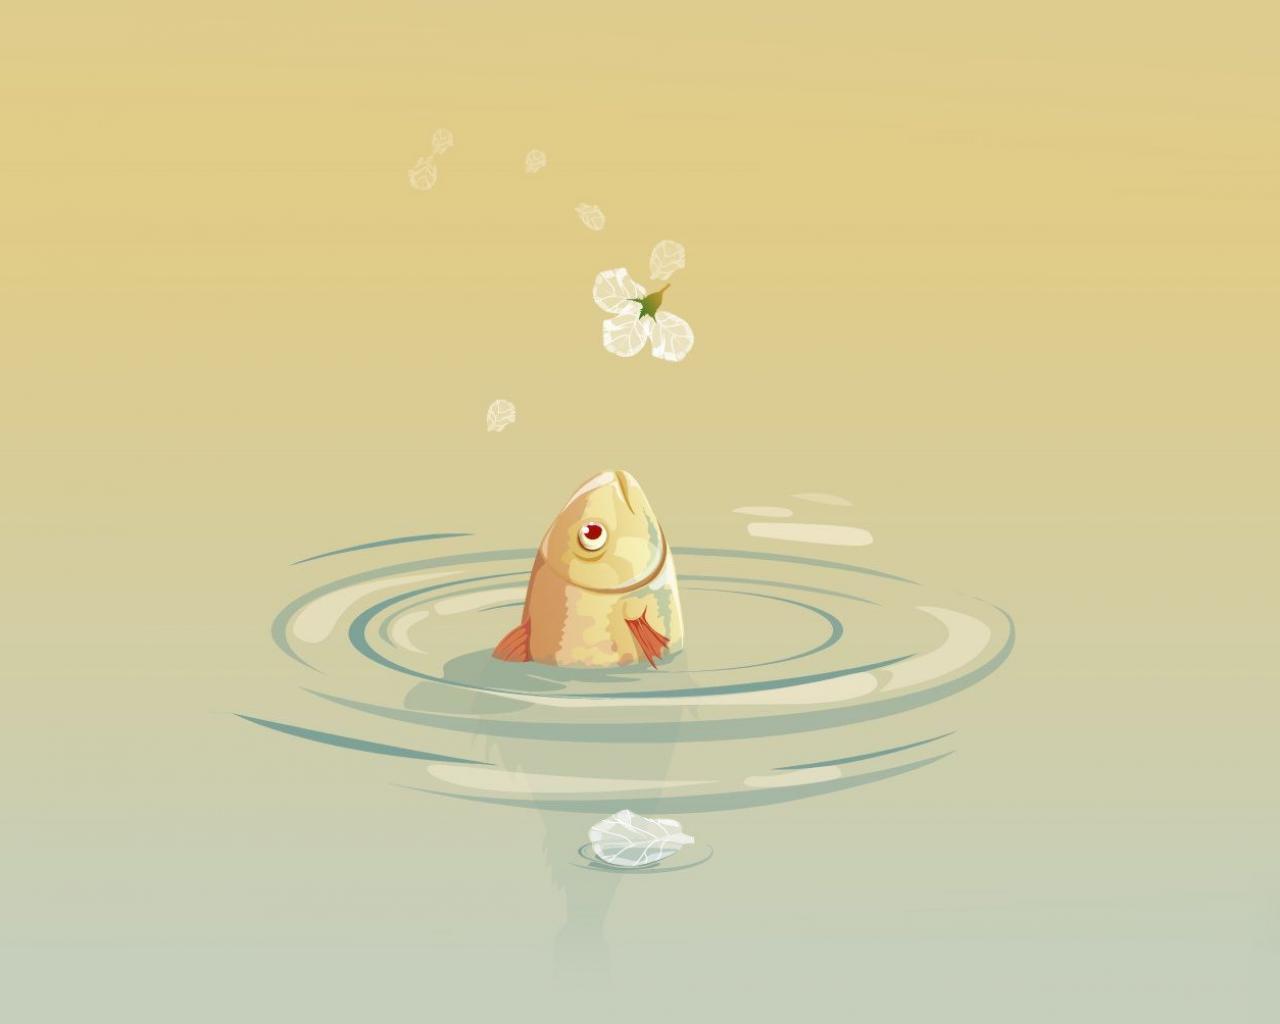 Рисунок рыбки обои 1280x1024.: http://hq-oboi.ru/wall/risunok_rybki_1280x1024